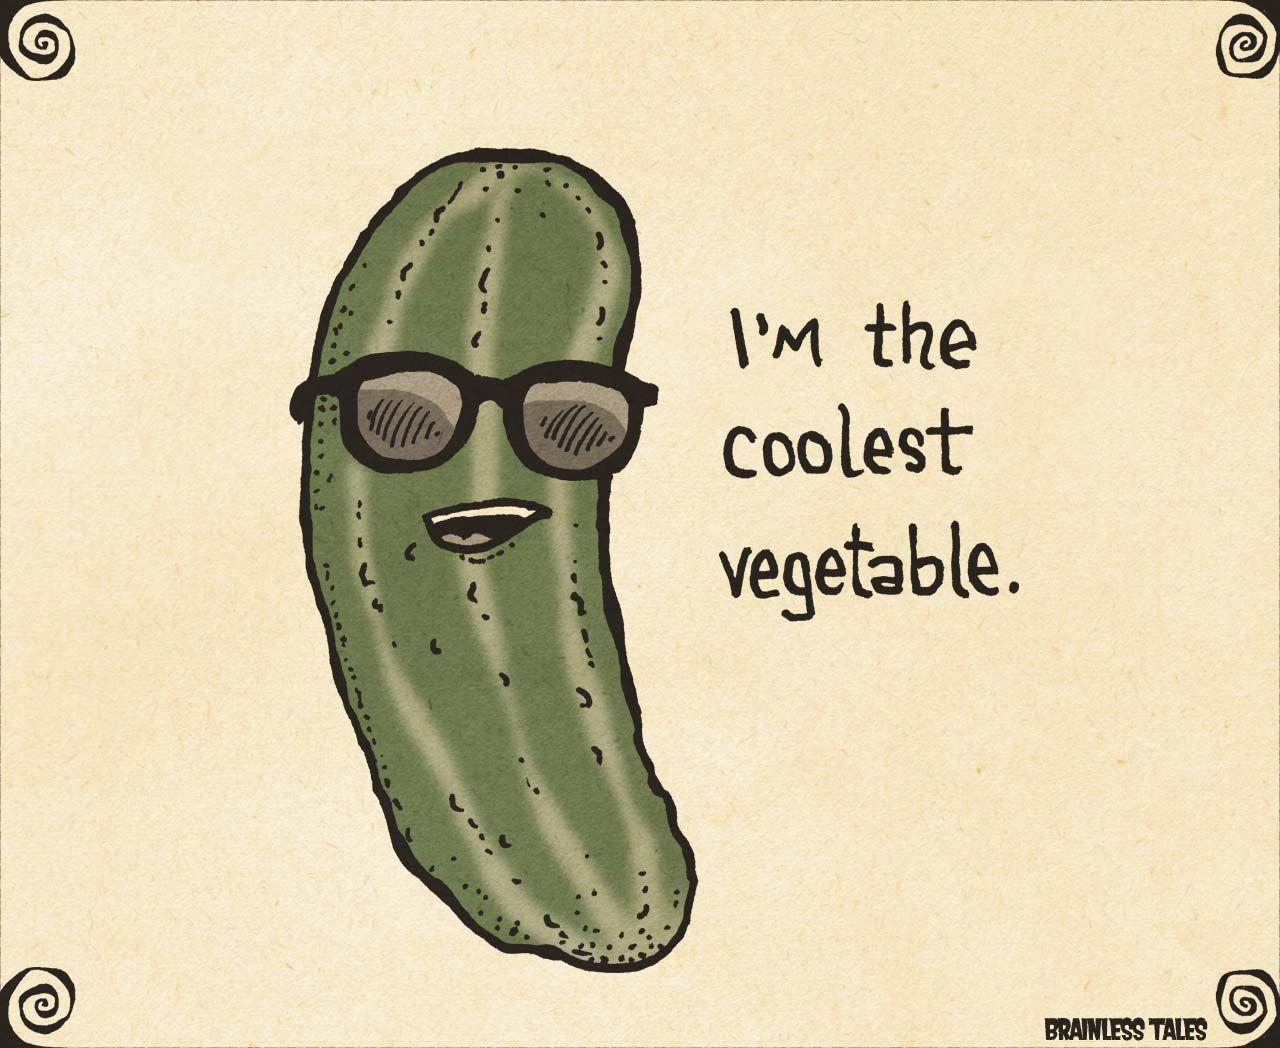 Coolest Vegetable Funny Puns Cool Stuff Humor